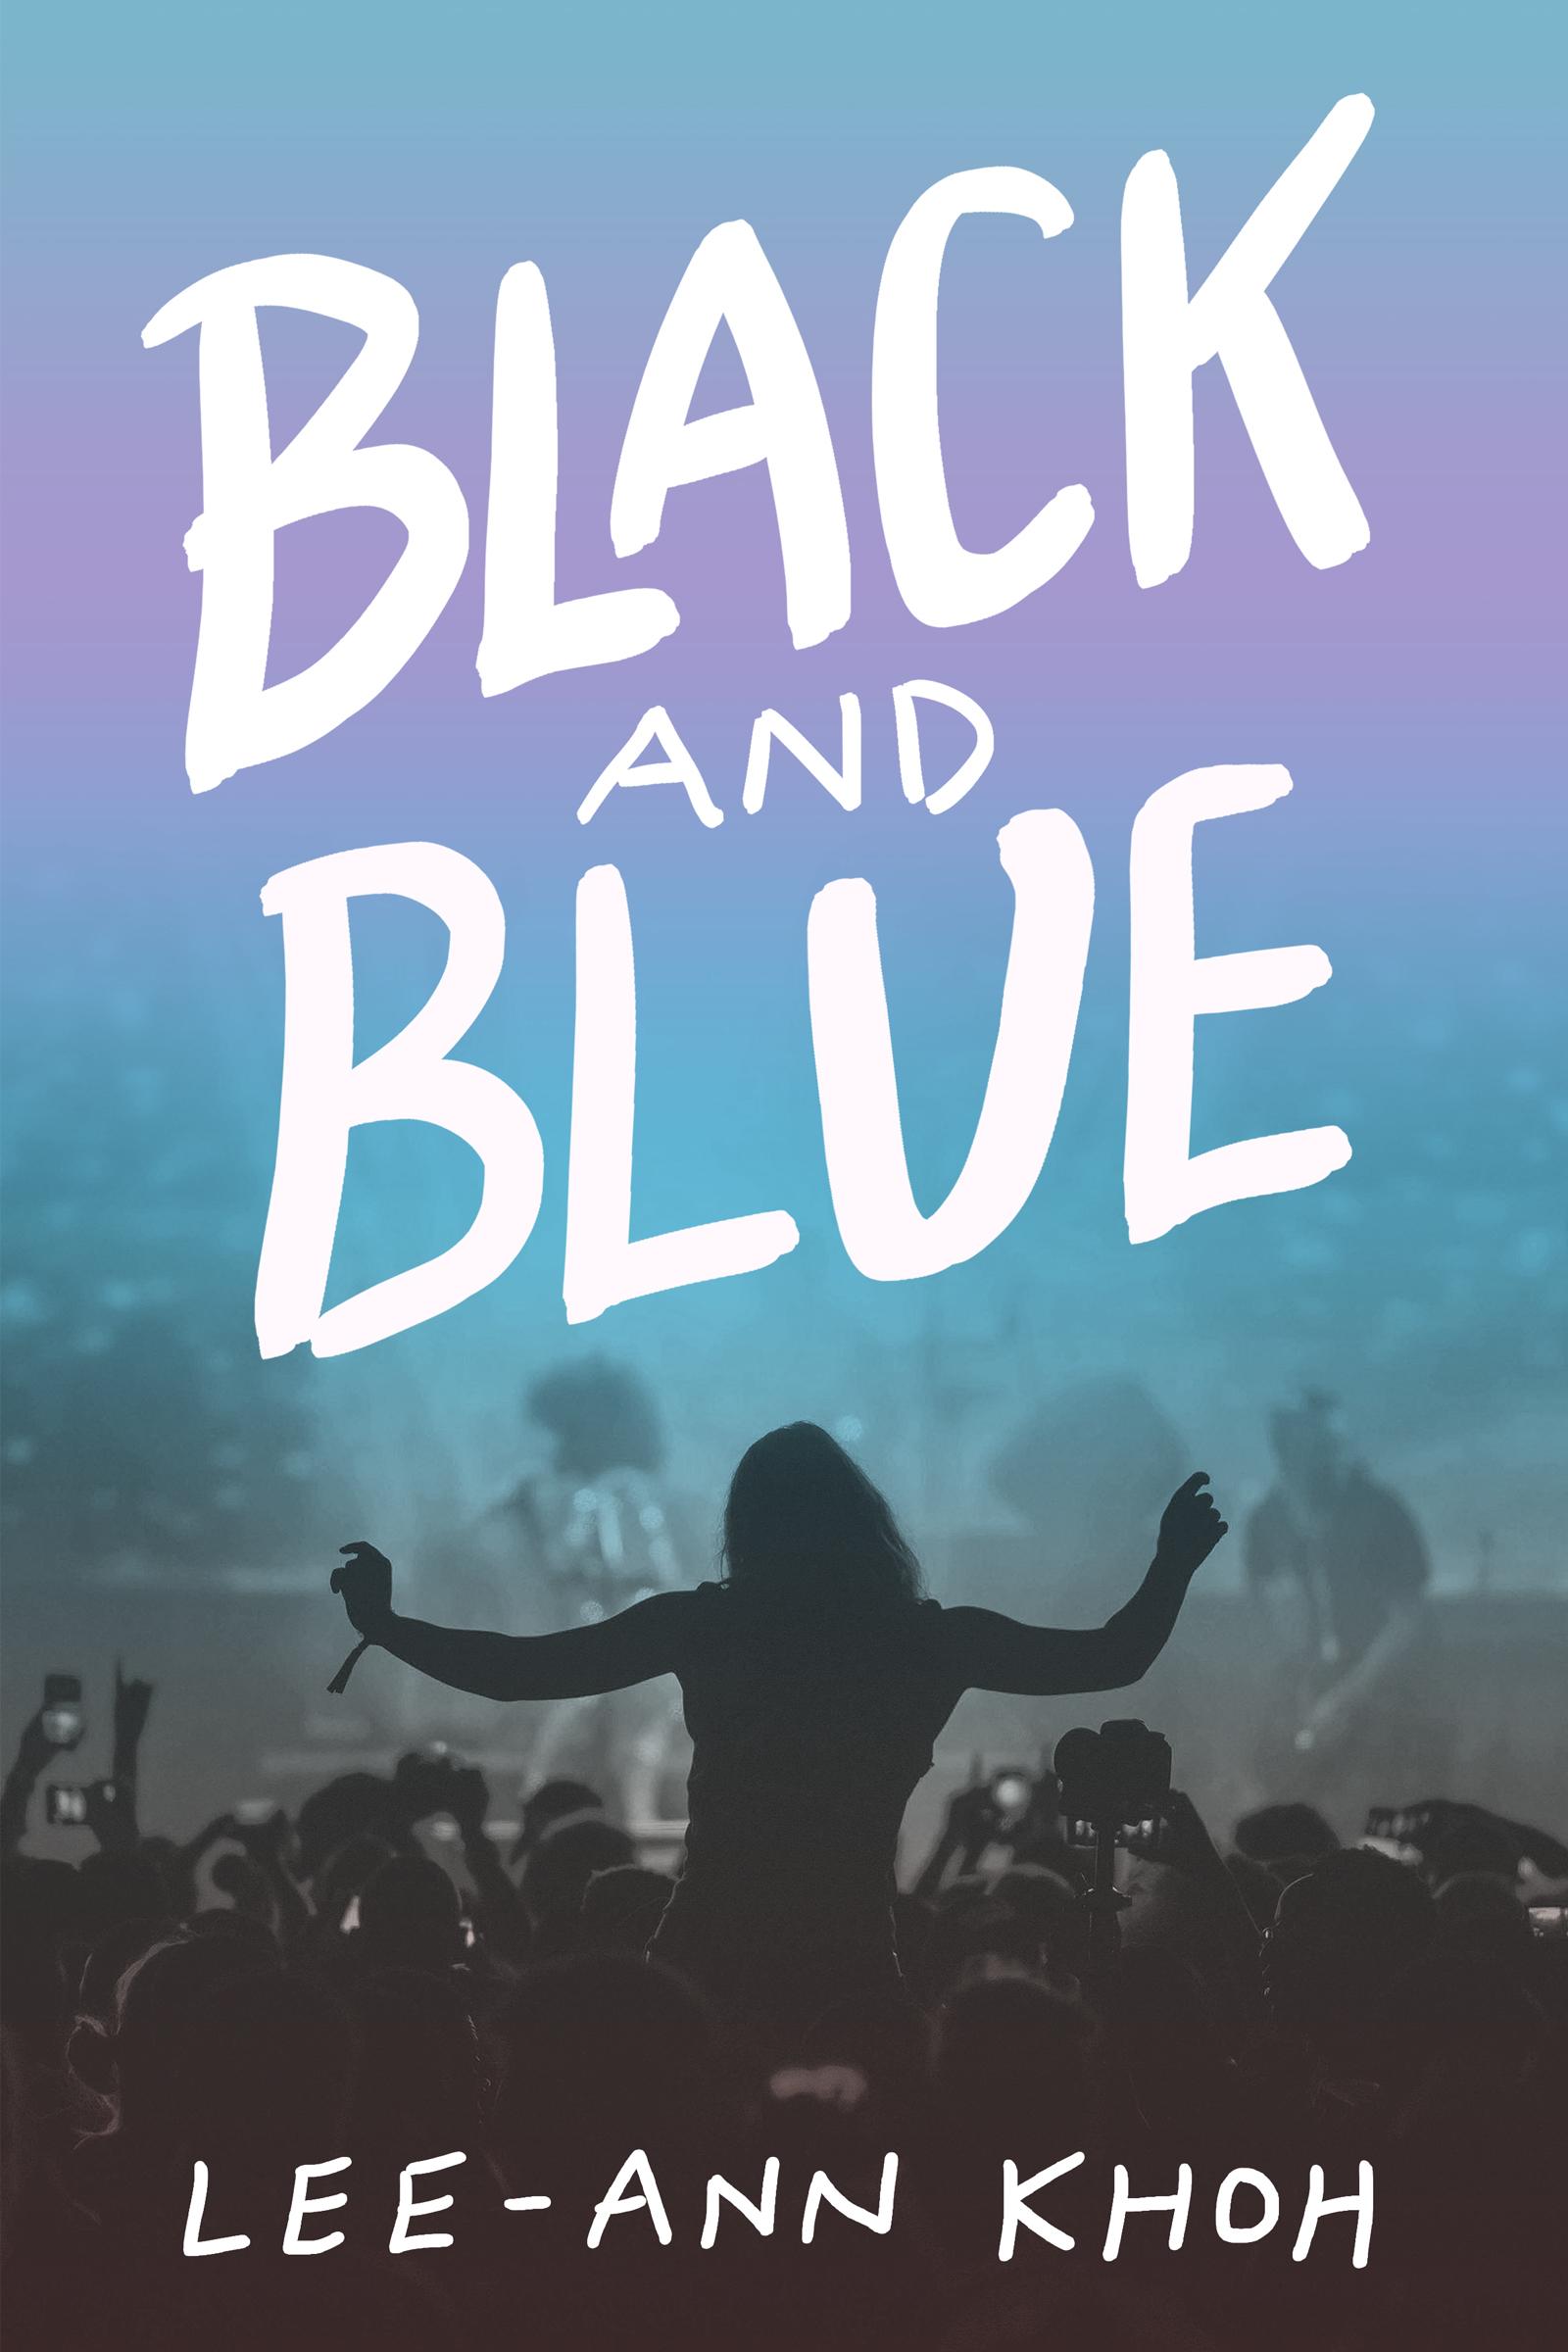 Black and Blue Lee-Ann Khoh Book Cover